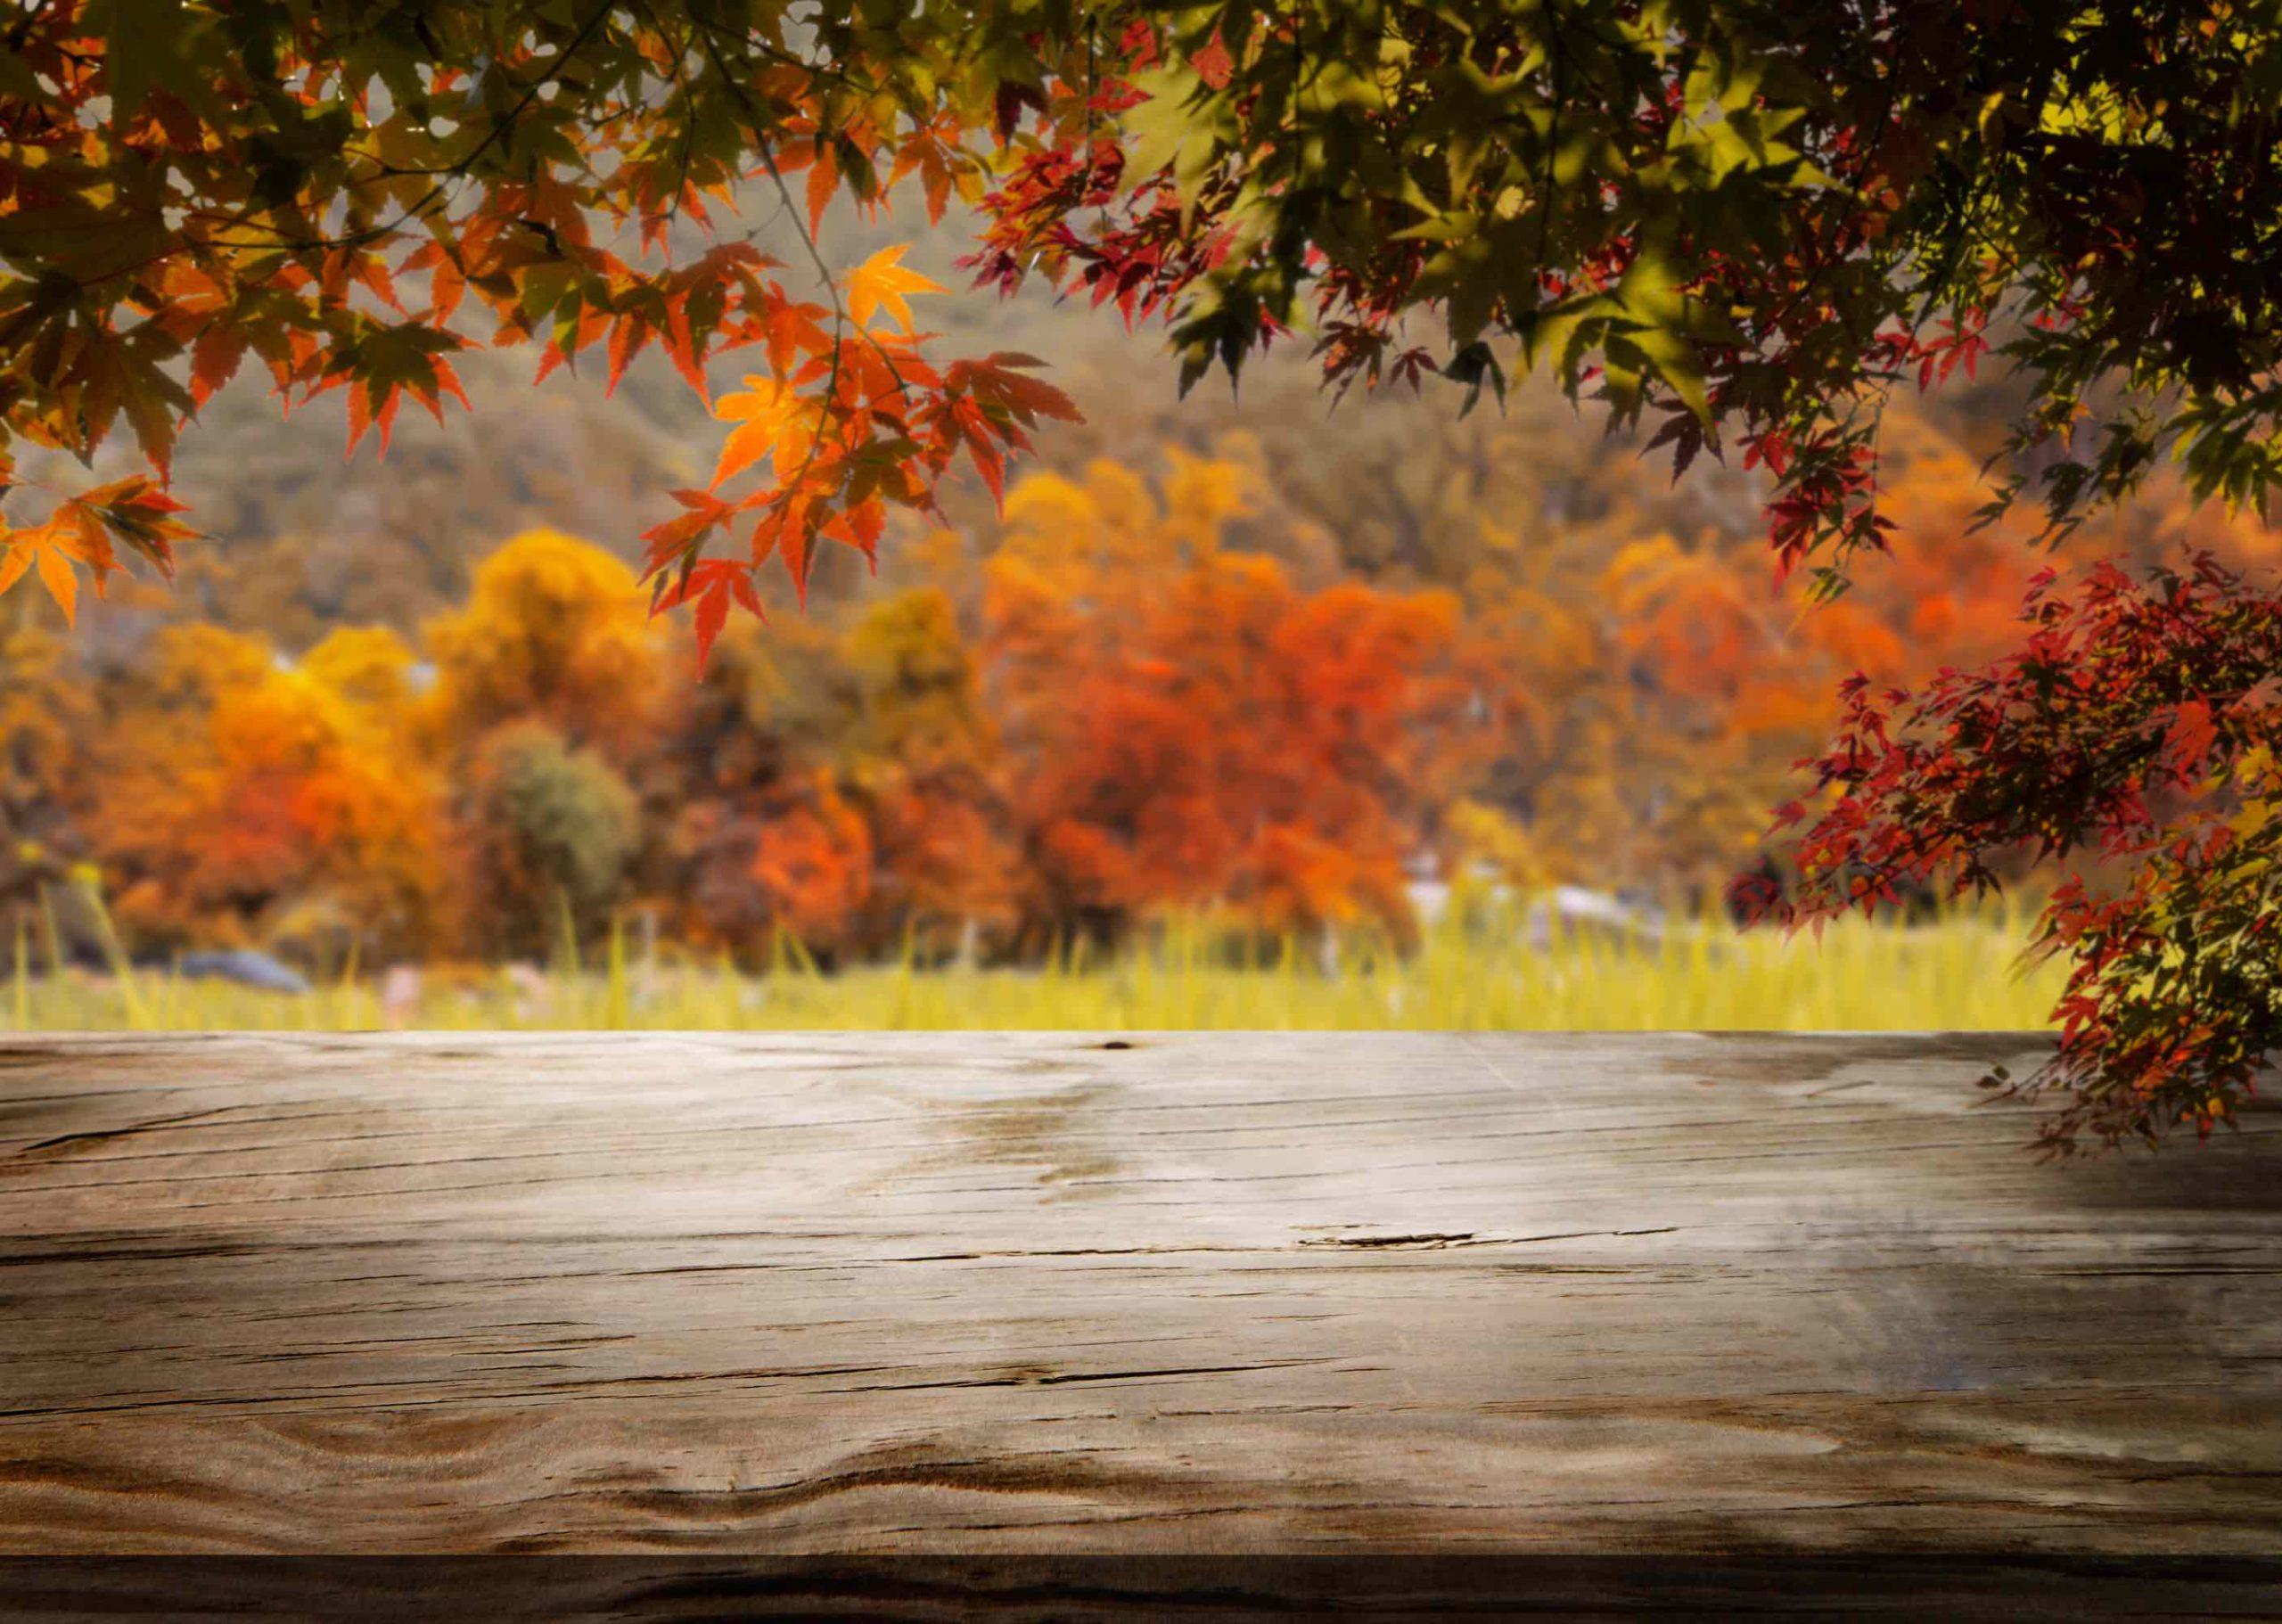 Celebrate The New Season With These Stylish Fall Decor Ideas